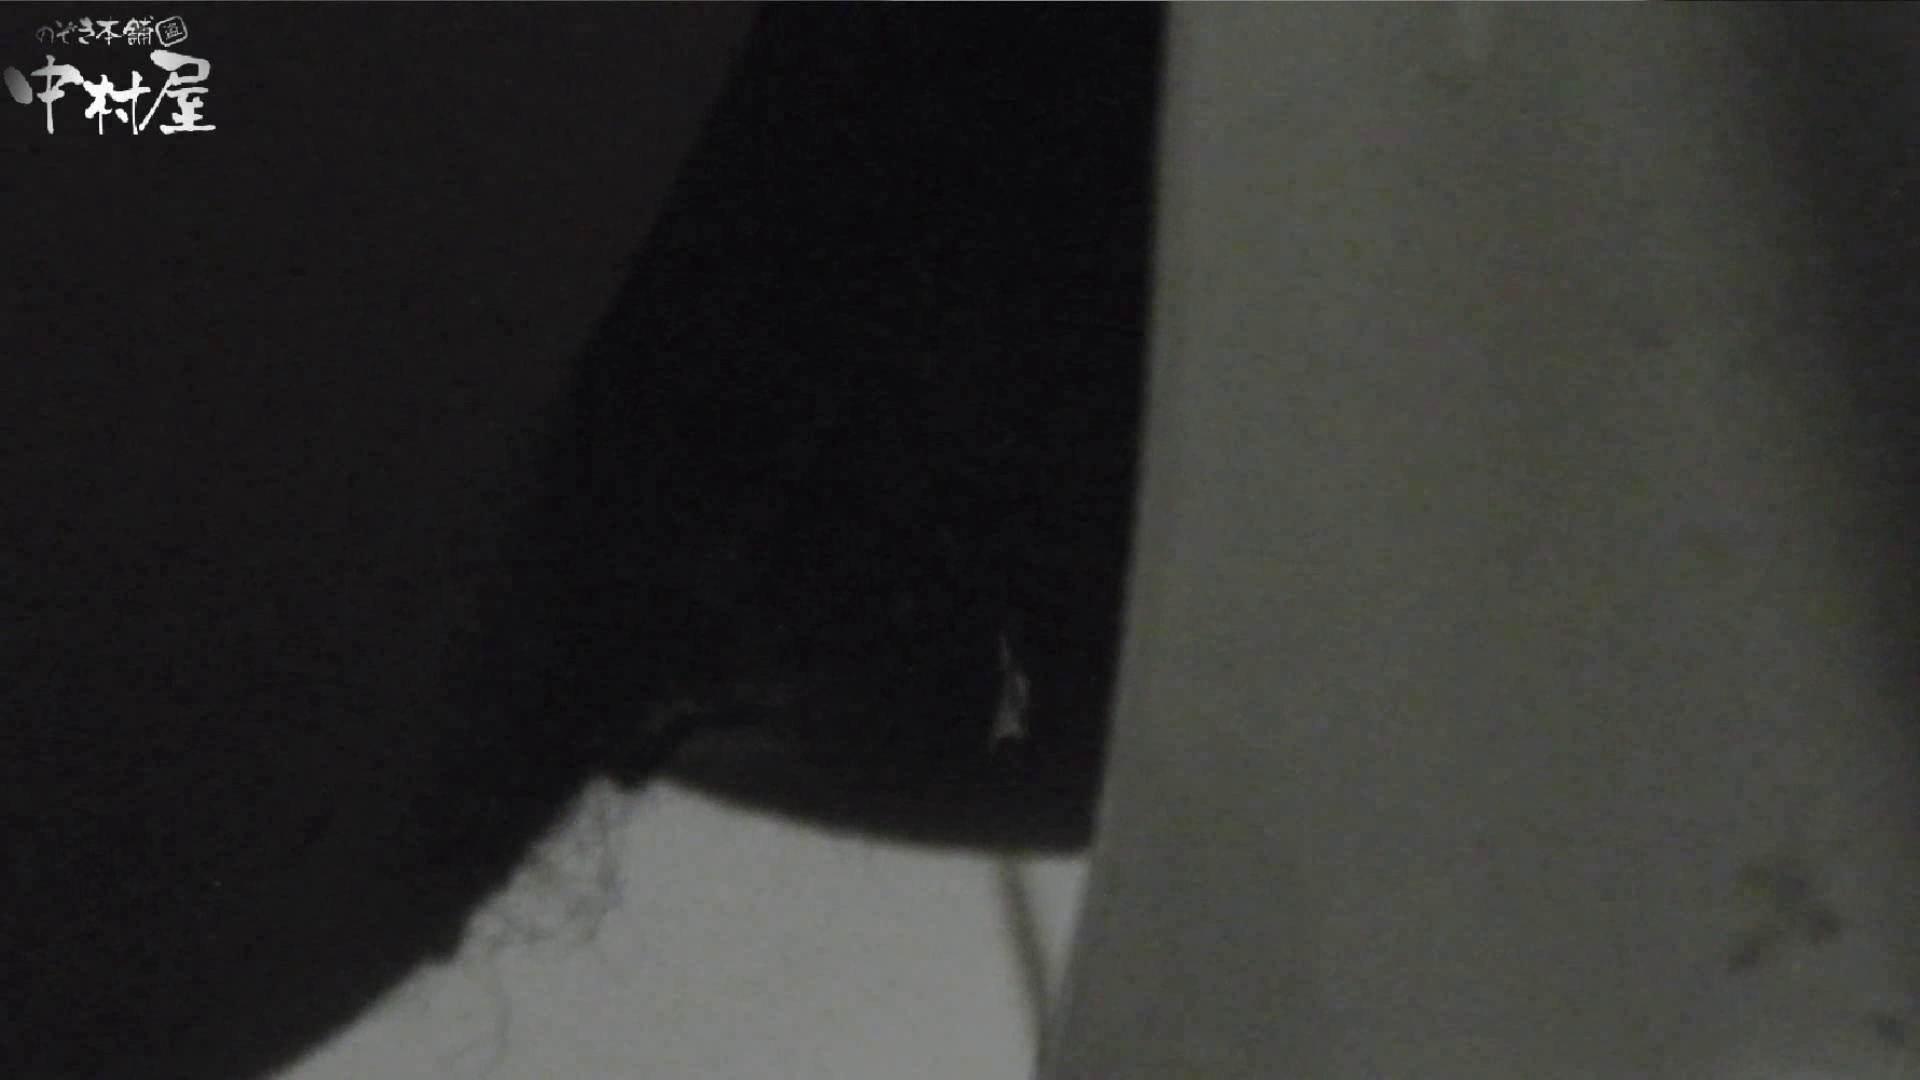 vol.42 命がけ潜伏洗面所! カカト上げながら・硬度強(太)・180g 洗面所 オマンコ無修正動画無料 79pic 39